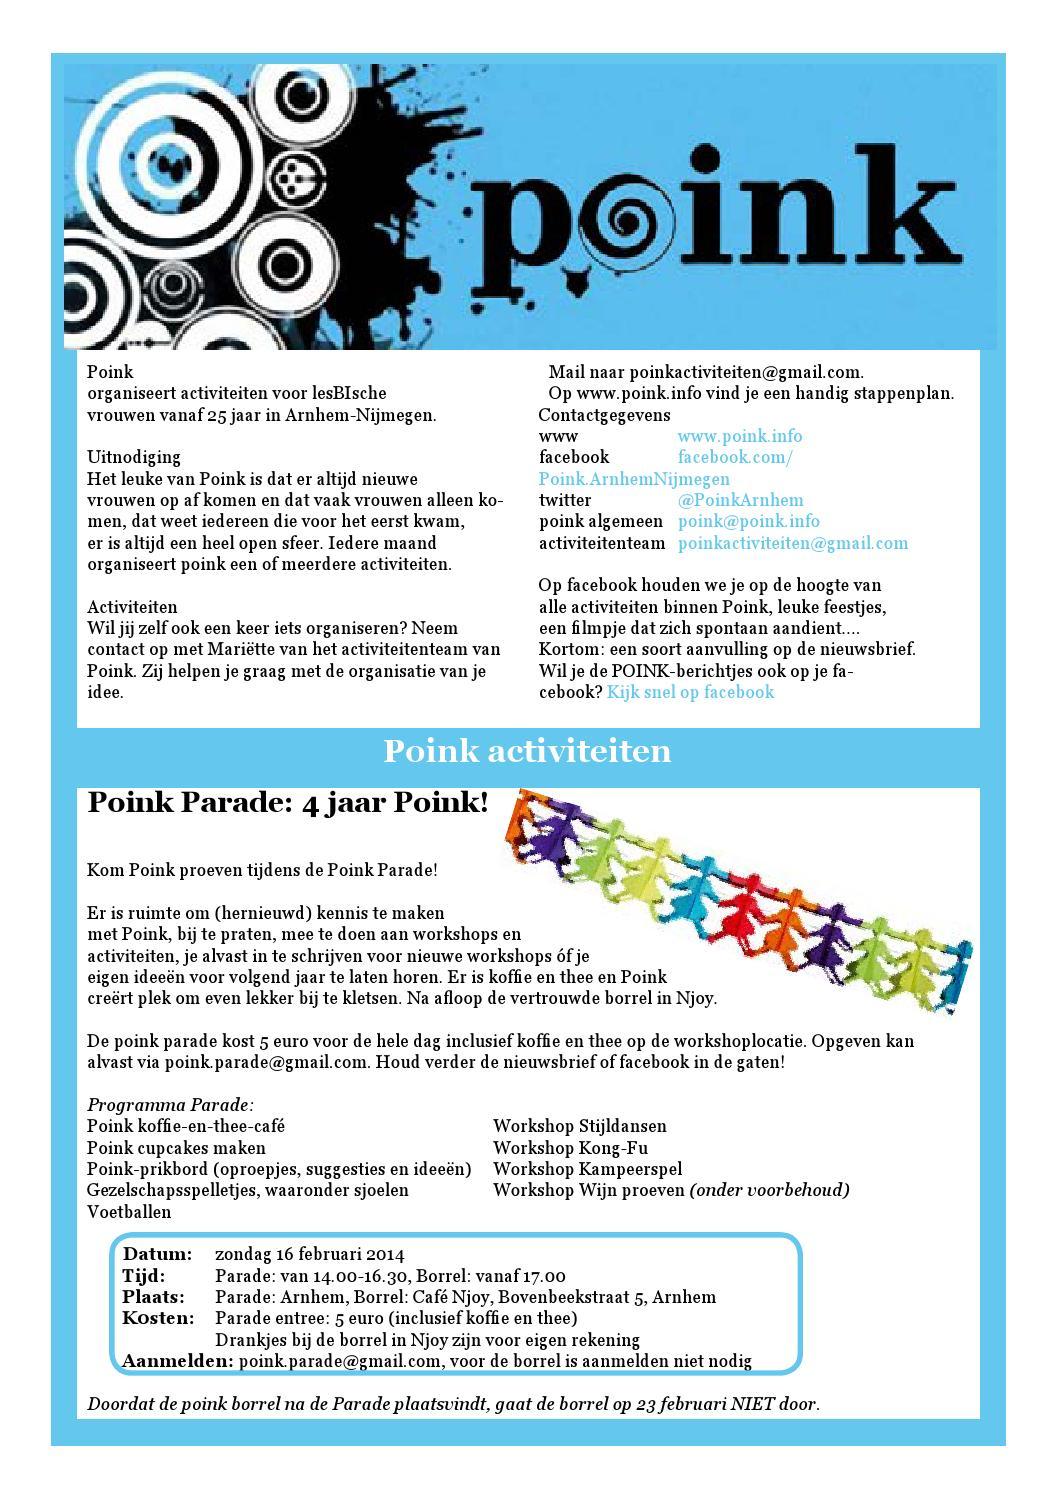 Poink nieuwsbrief februari 2014 by Poink Arnhem - issuu